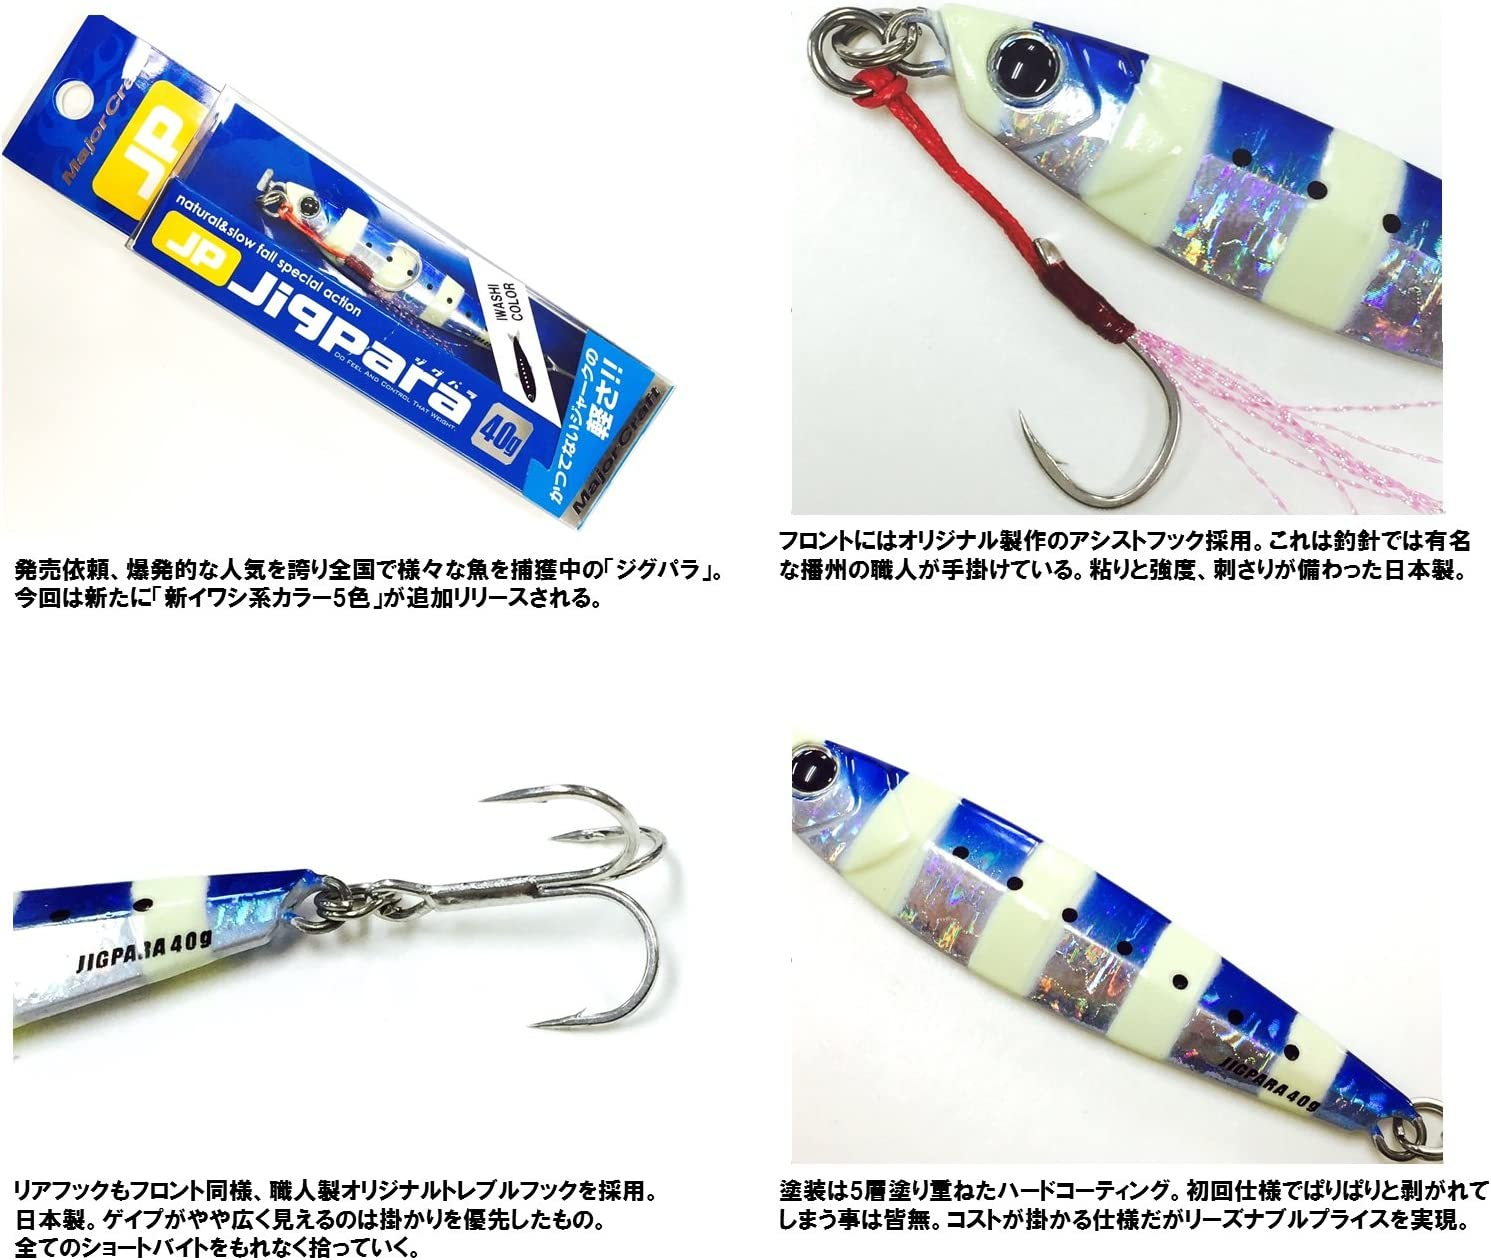 Major Craft Metal Jig Jigpara Short JPS-30 Grams 030 5409 4560350785409